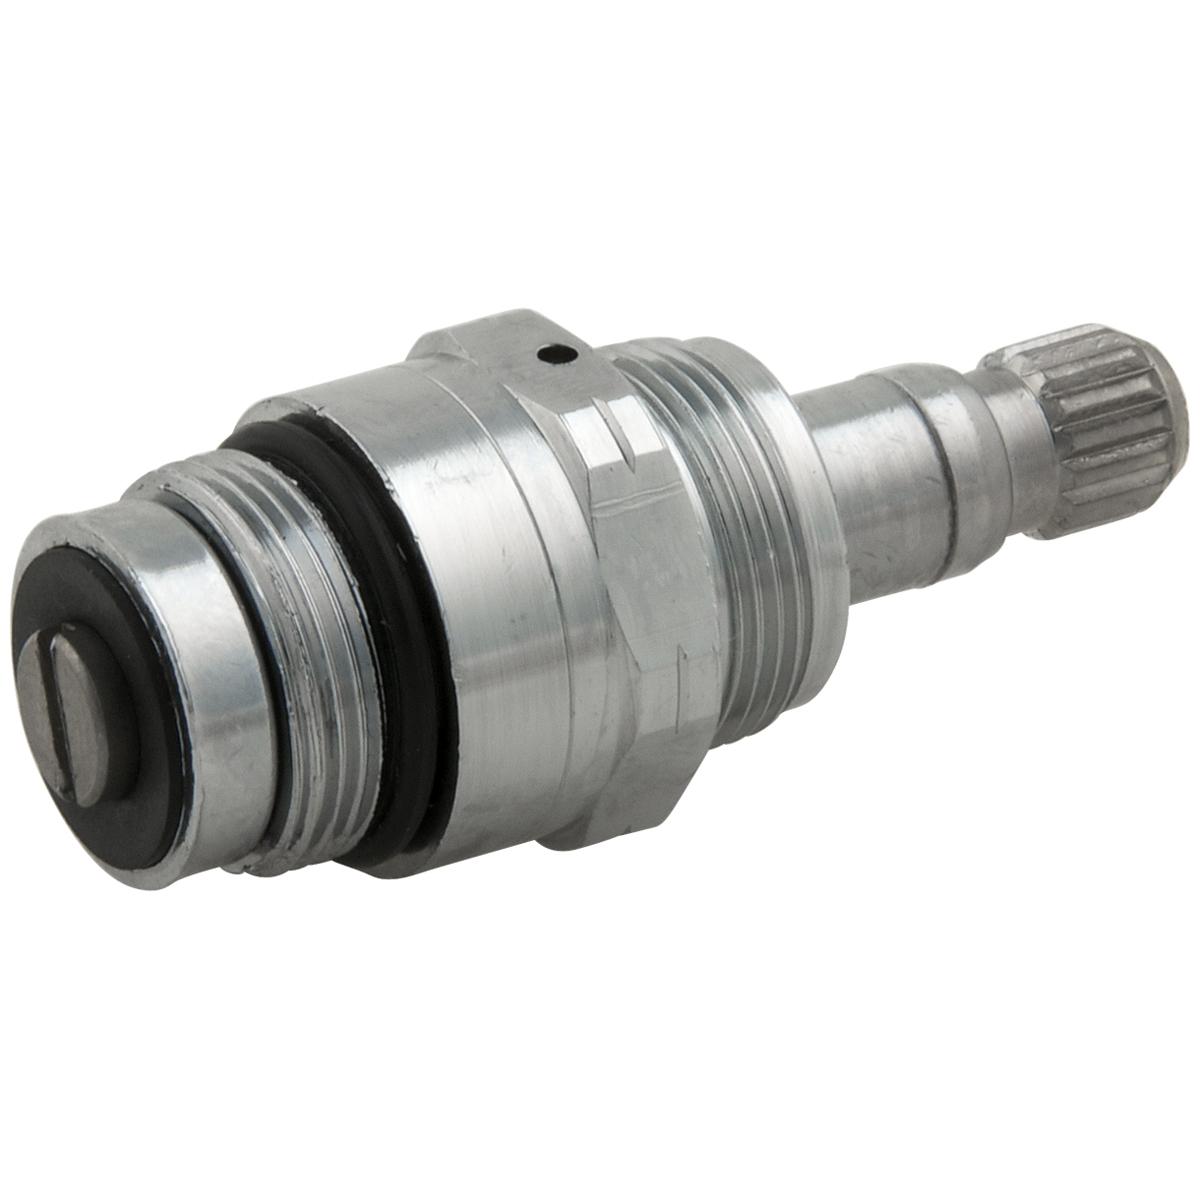 Ideas, belanger faucet single lever cartridge belanger faucet single lever cartridge cartridge assemblies product categories master plumber 1200 x 1200  .